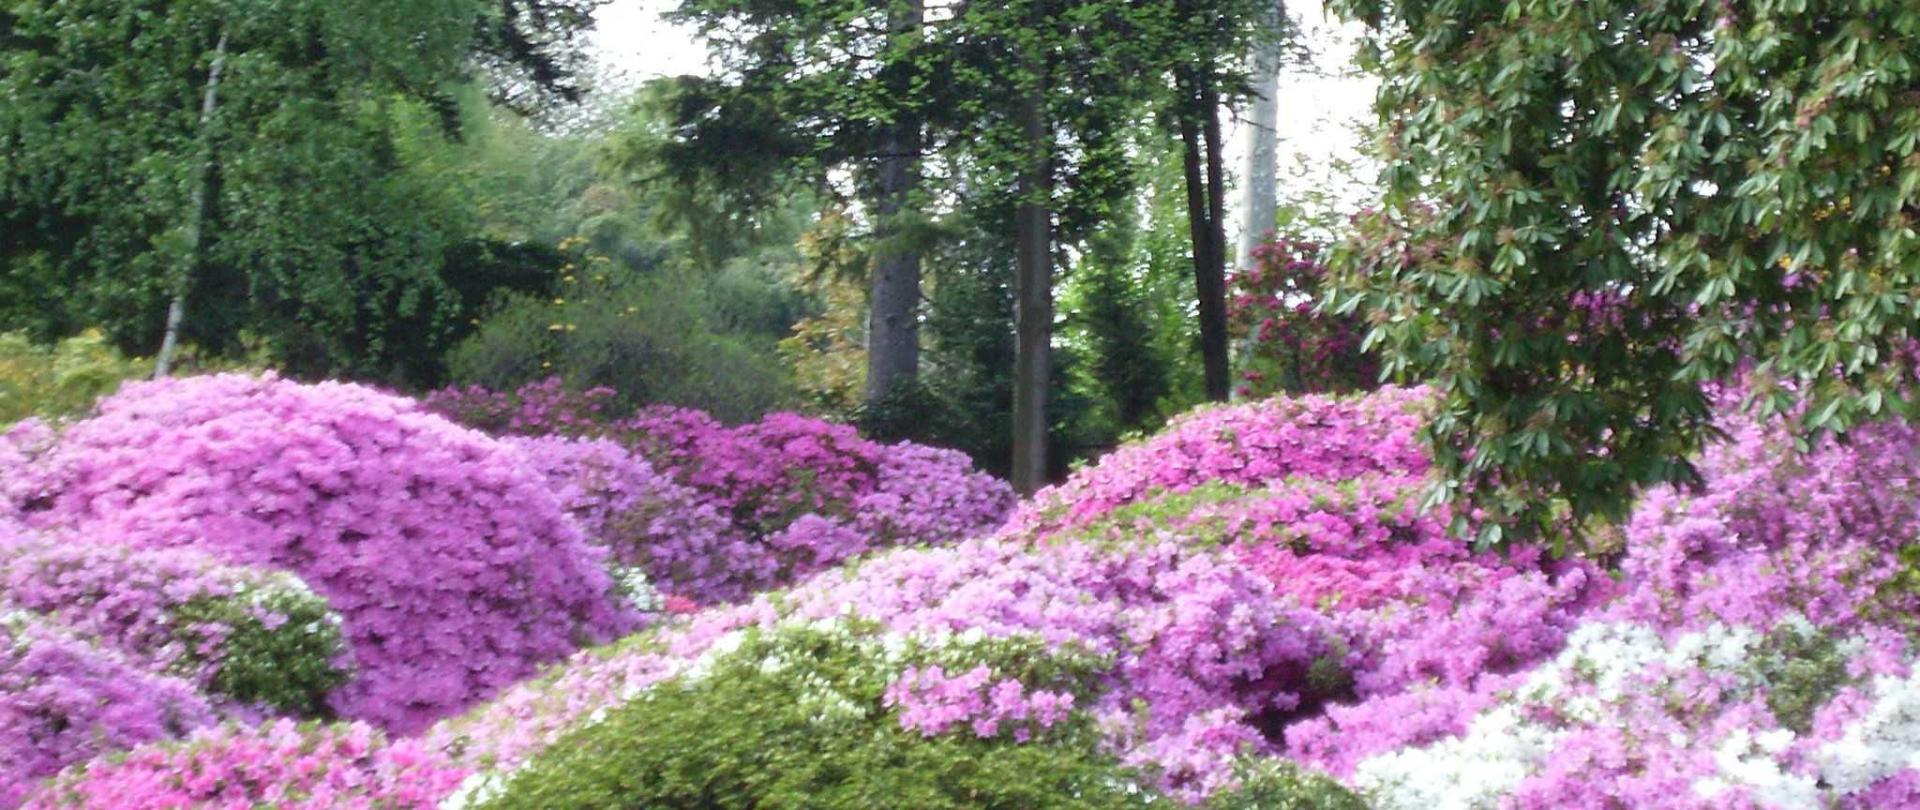 azaleas-in-villa-carlotta-gardens.jpg